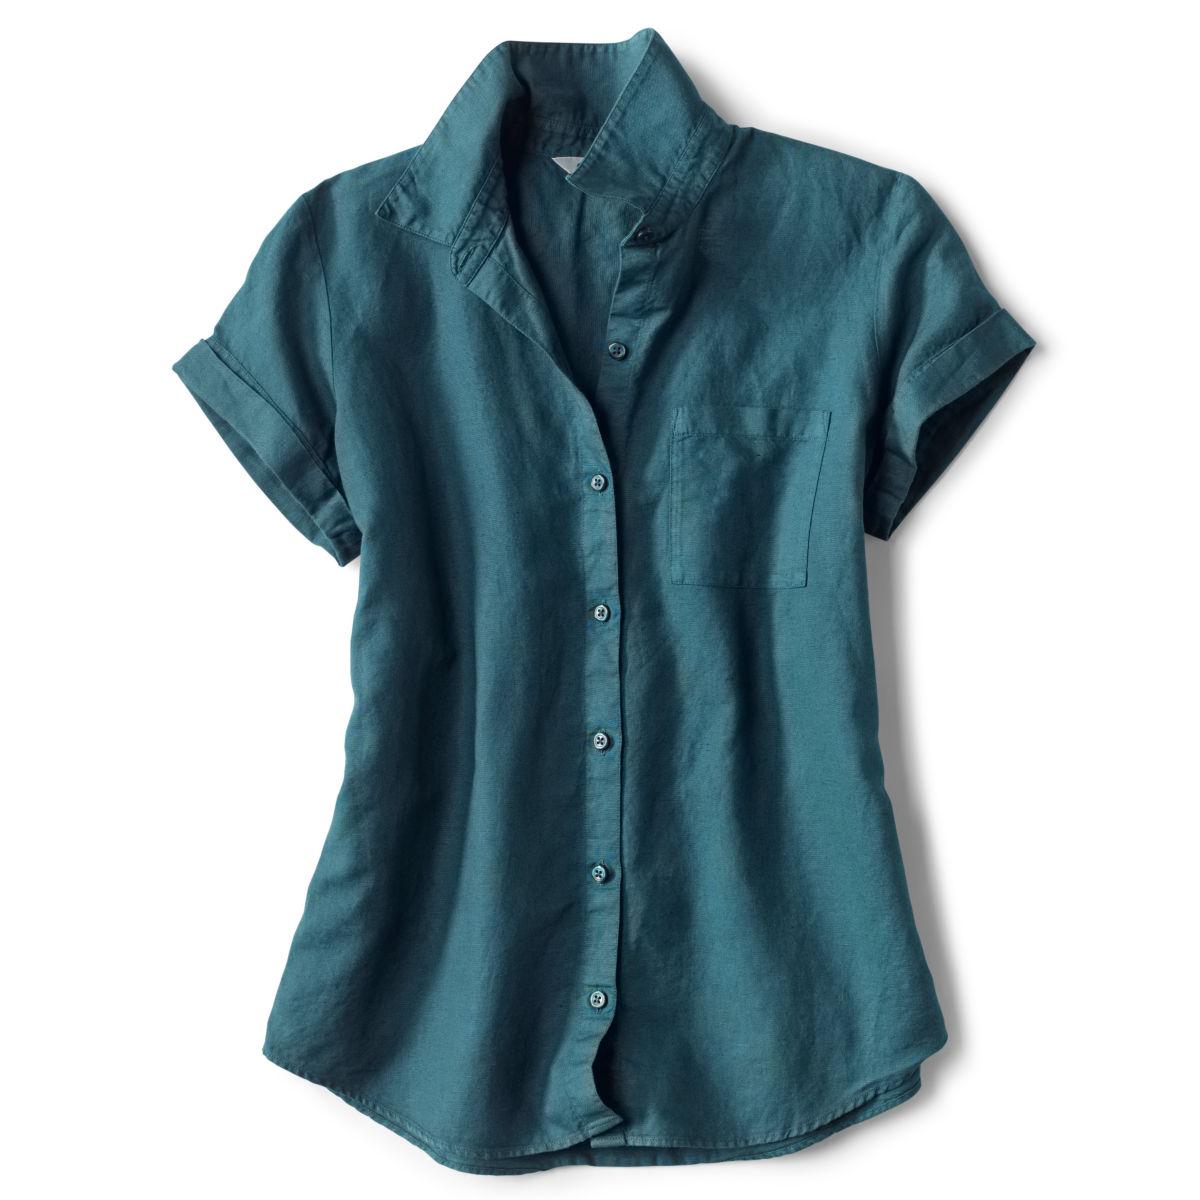 Linen/Cotton Garment-Dyed Short-Sleeved Shirt - ATLANTICimage number 0